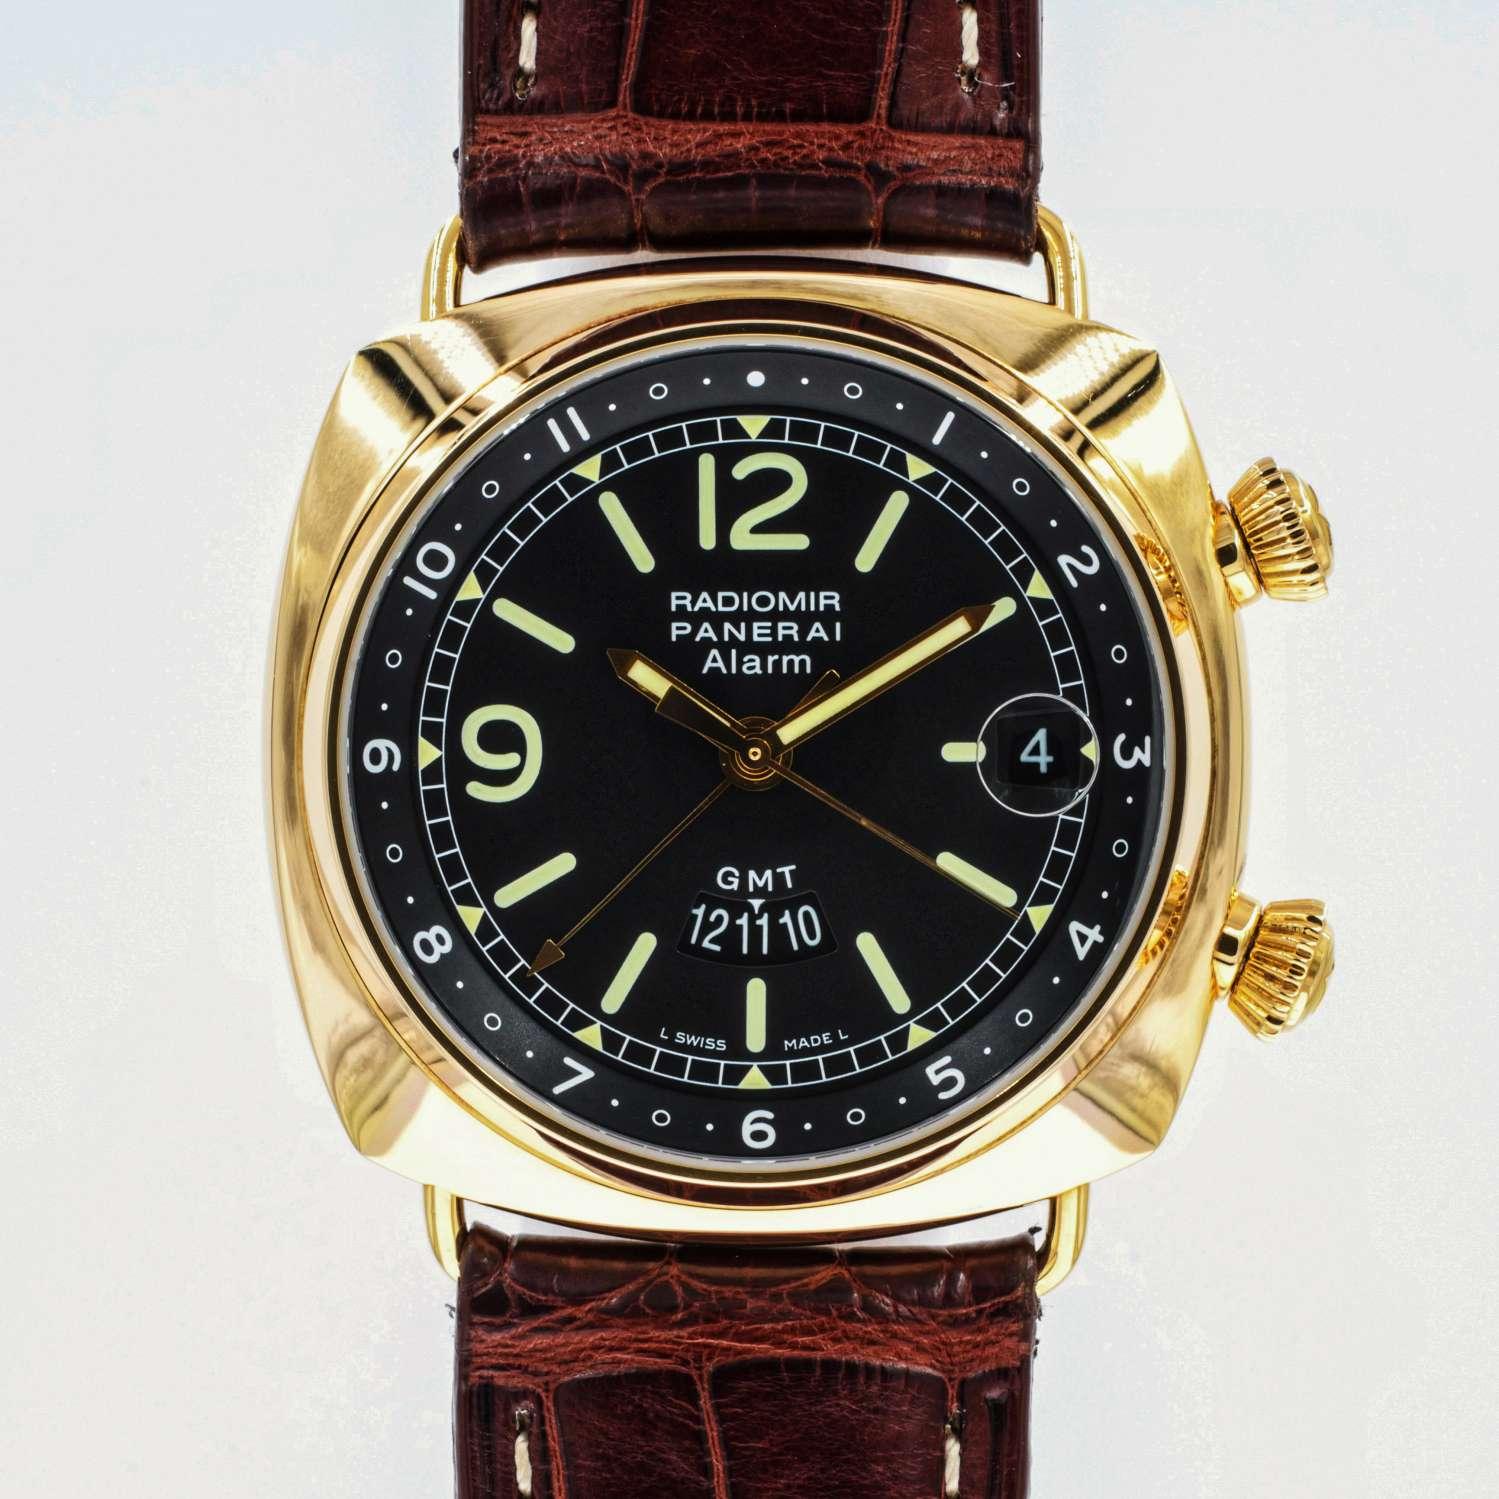 Panerai Radoimir 42 GMT Alarm PAM238, Boxed 198/200